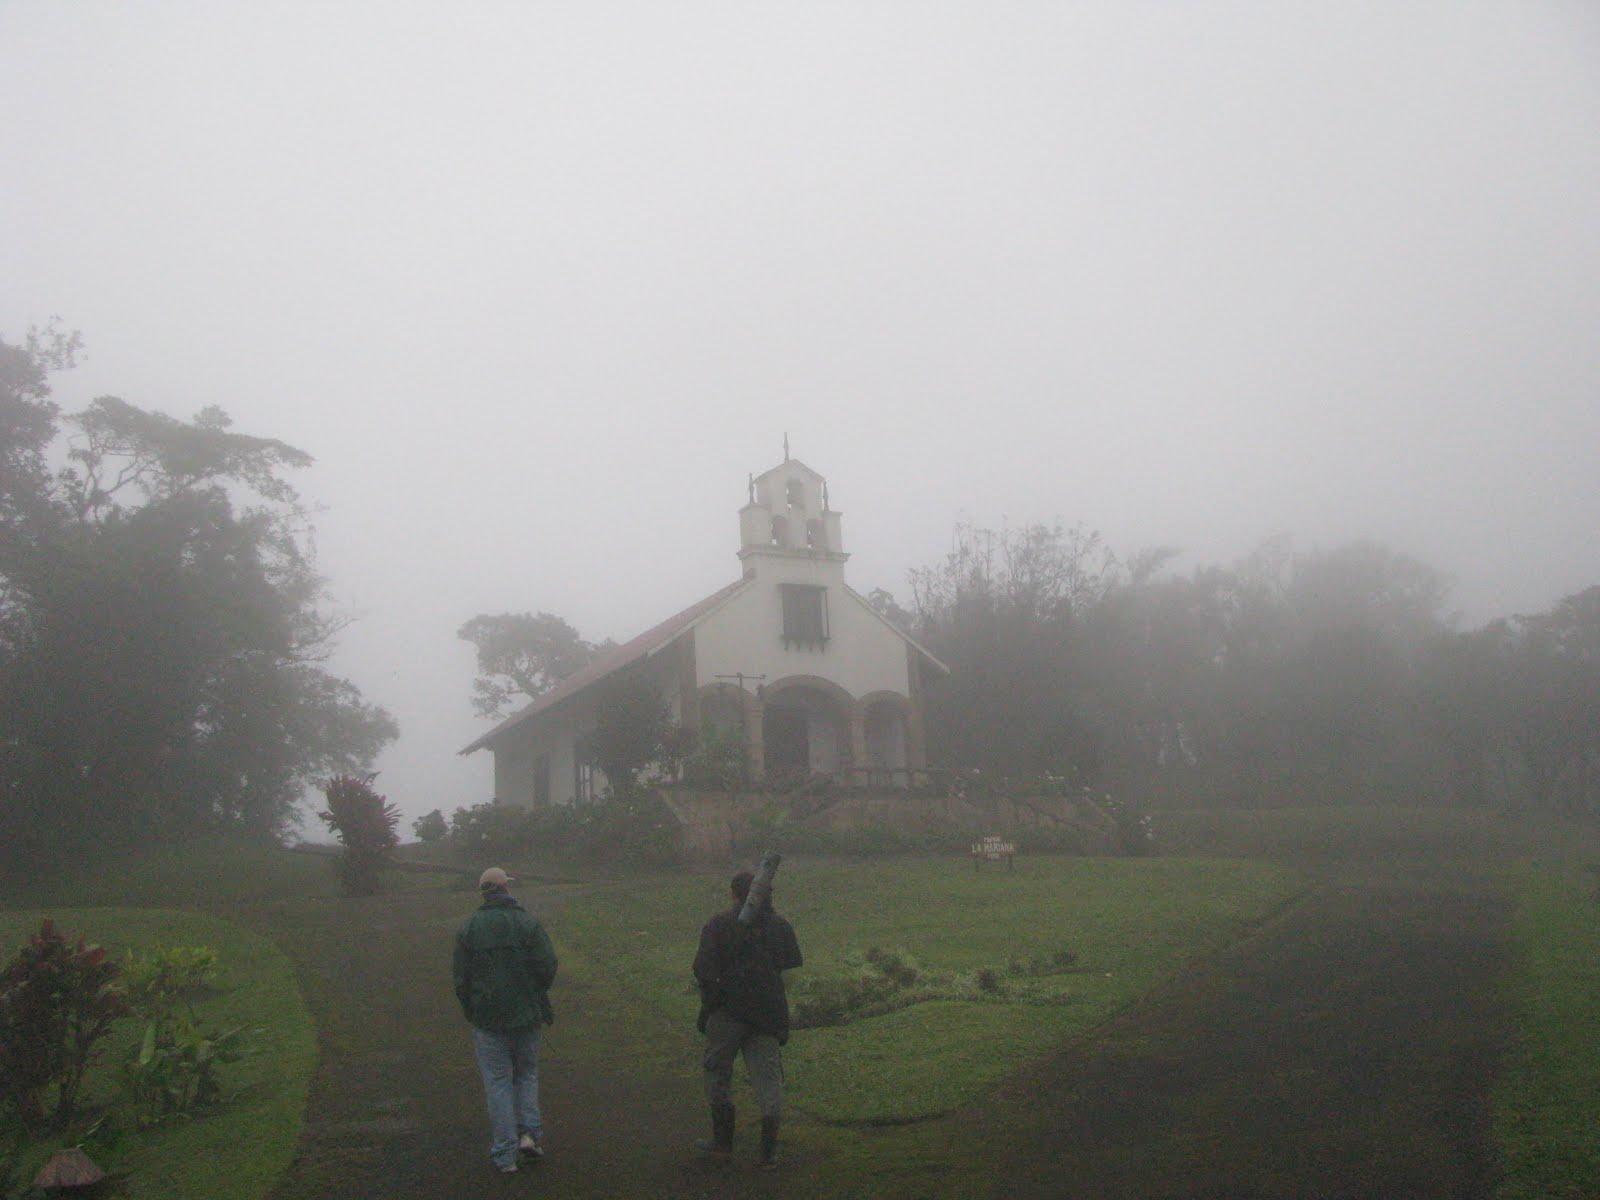 Rancho el Rio, Natural Paradise / Farm. Proce ... - VRBO